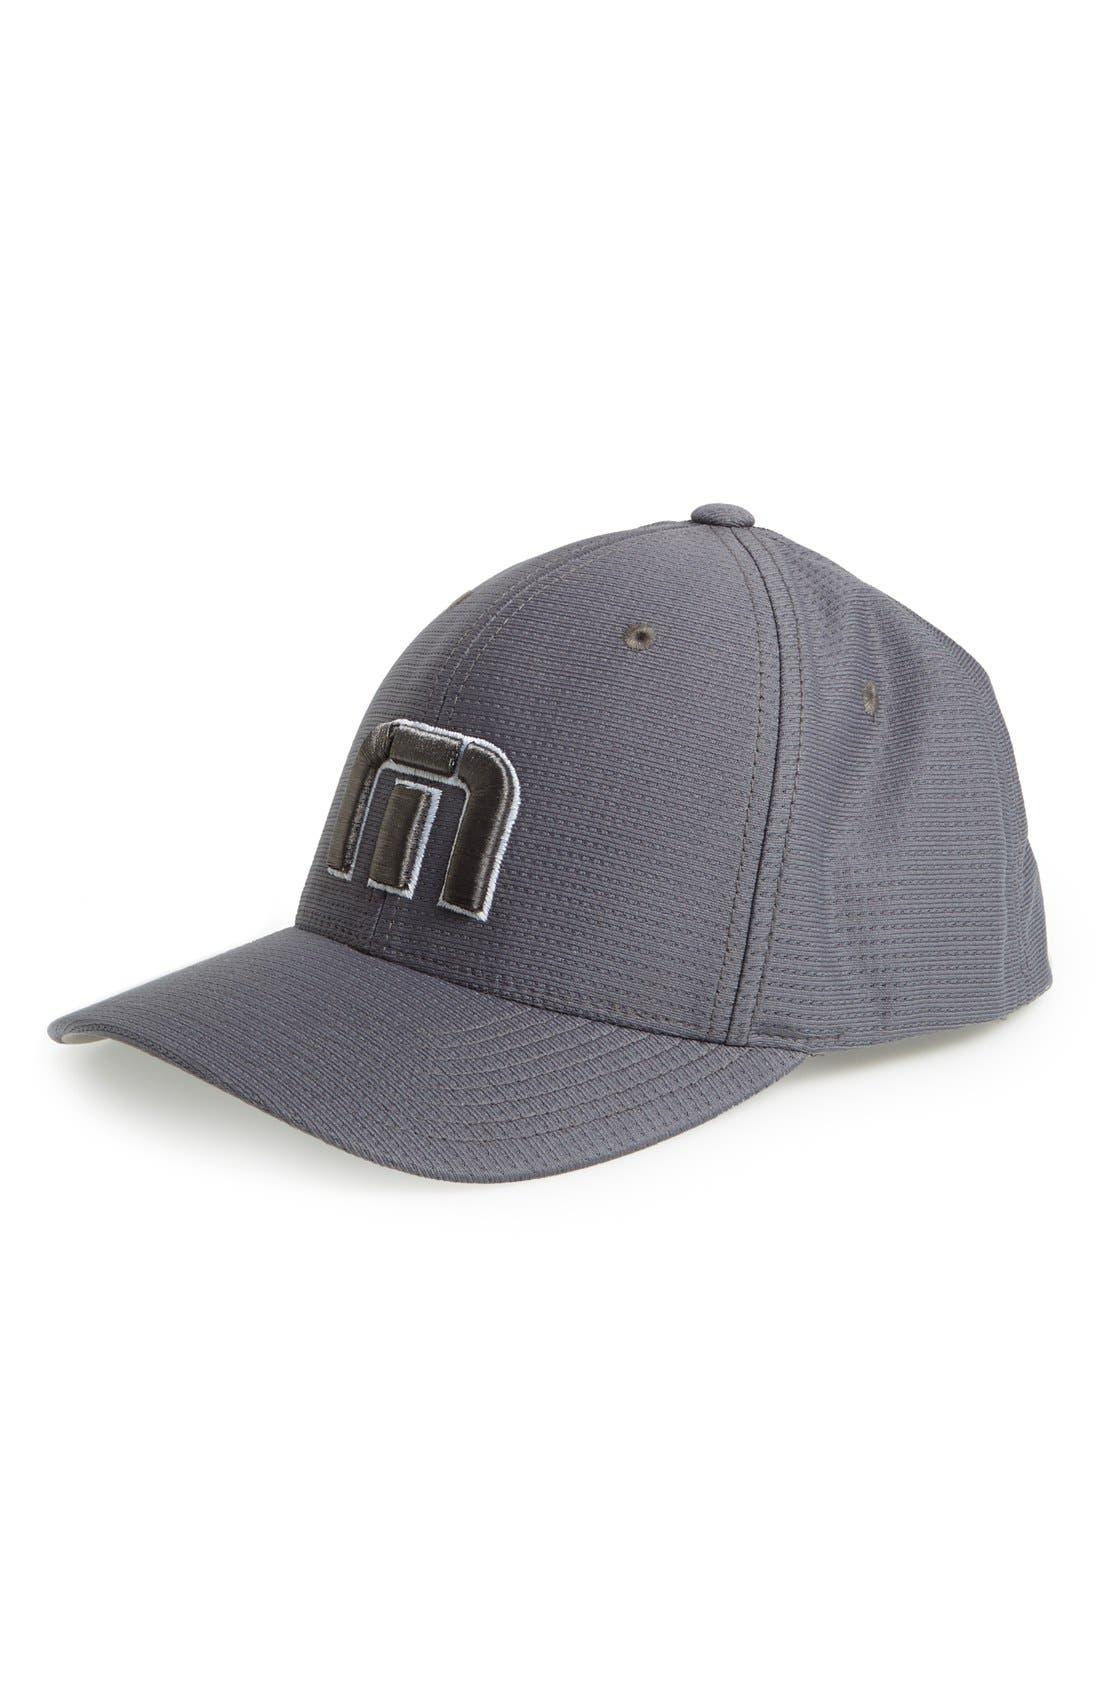 TRAVIS MATHEW B-Bahamas Hat